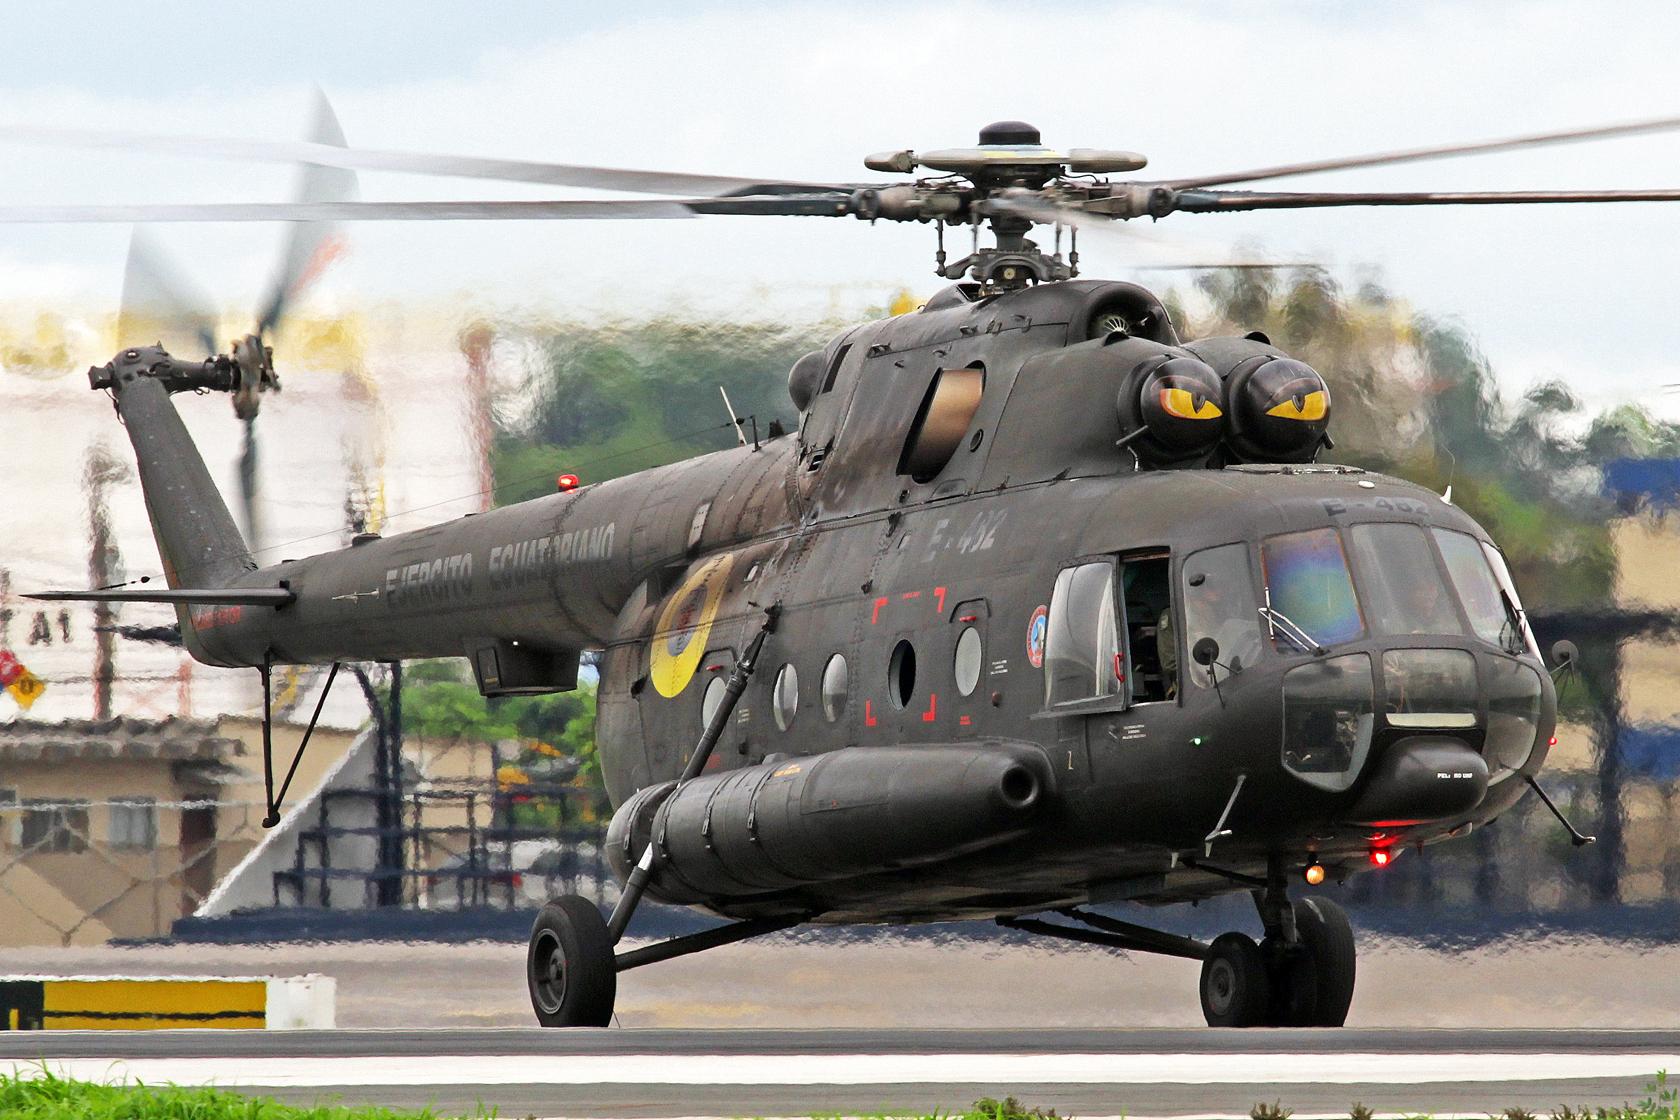 Ejercito Ecuatoriano Mil Mi-171 E-482 - Mein absolutes Tageshighlight! An Bord befand sich übrigens der ecuadorianische Staatspräsident Rafael Correa auf dem Weg nach Babahoyo.